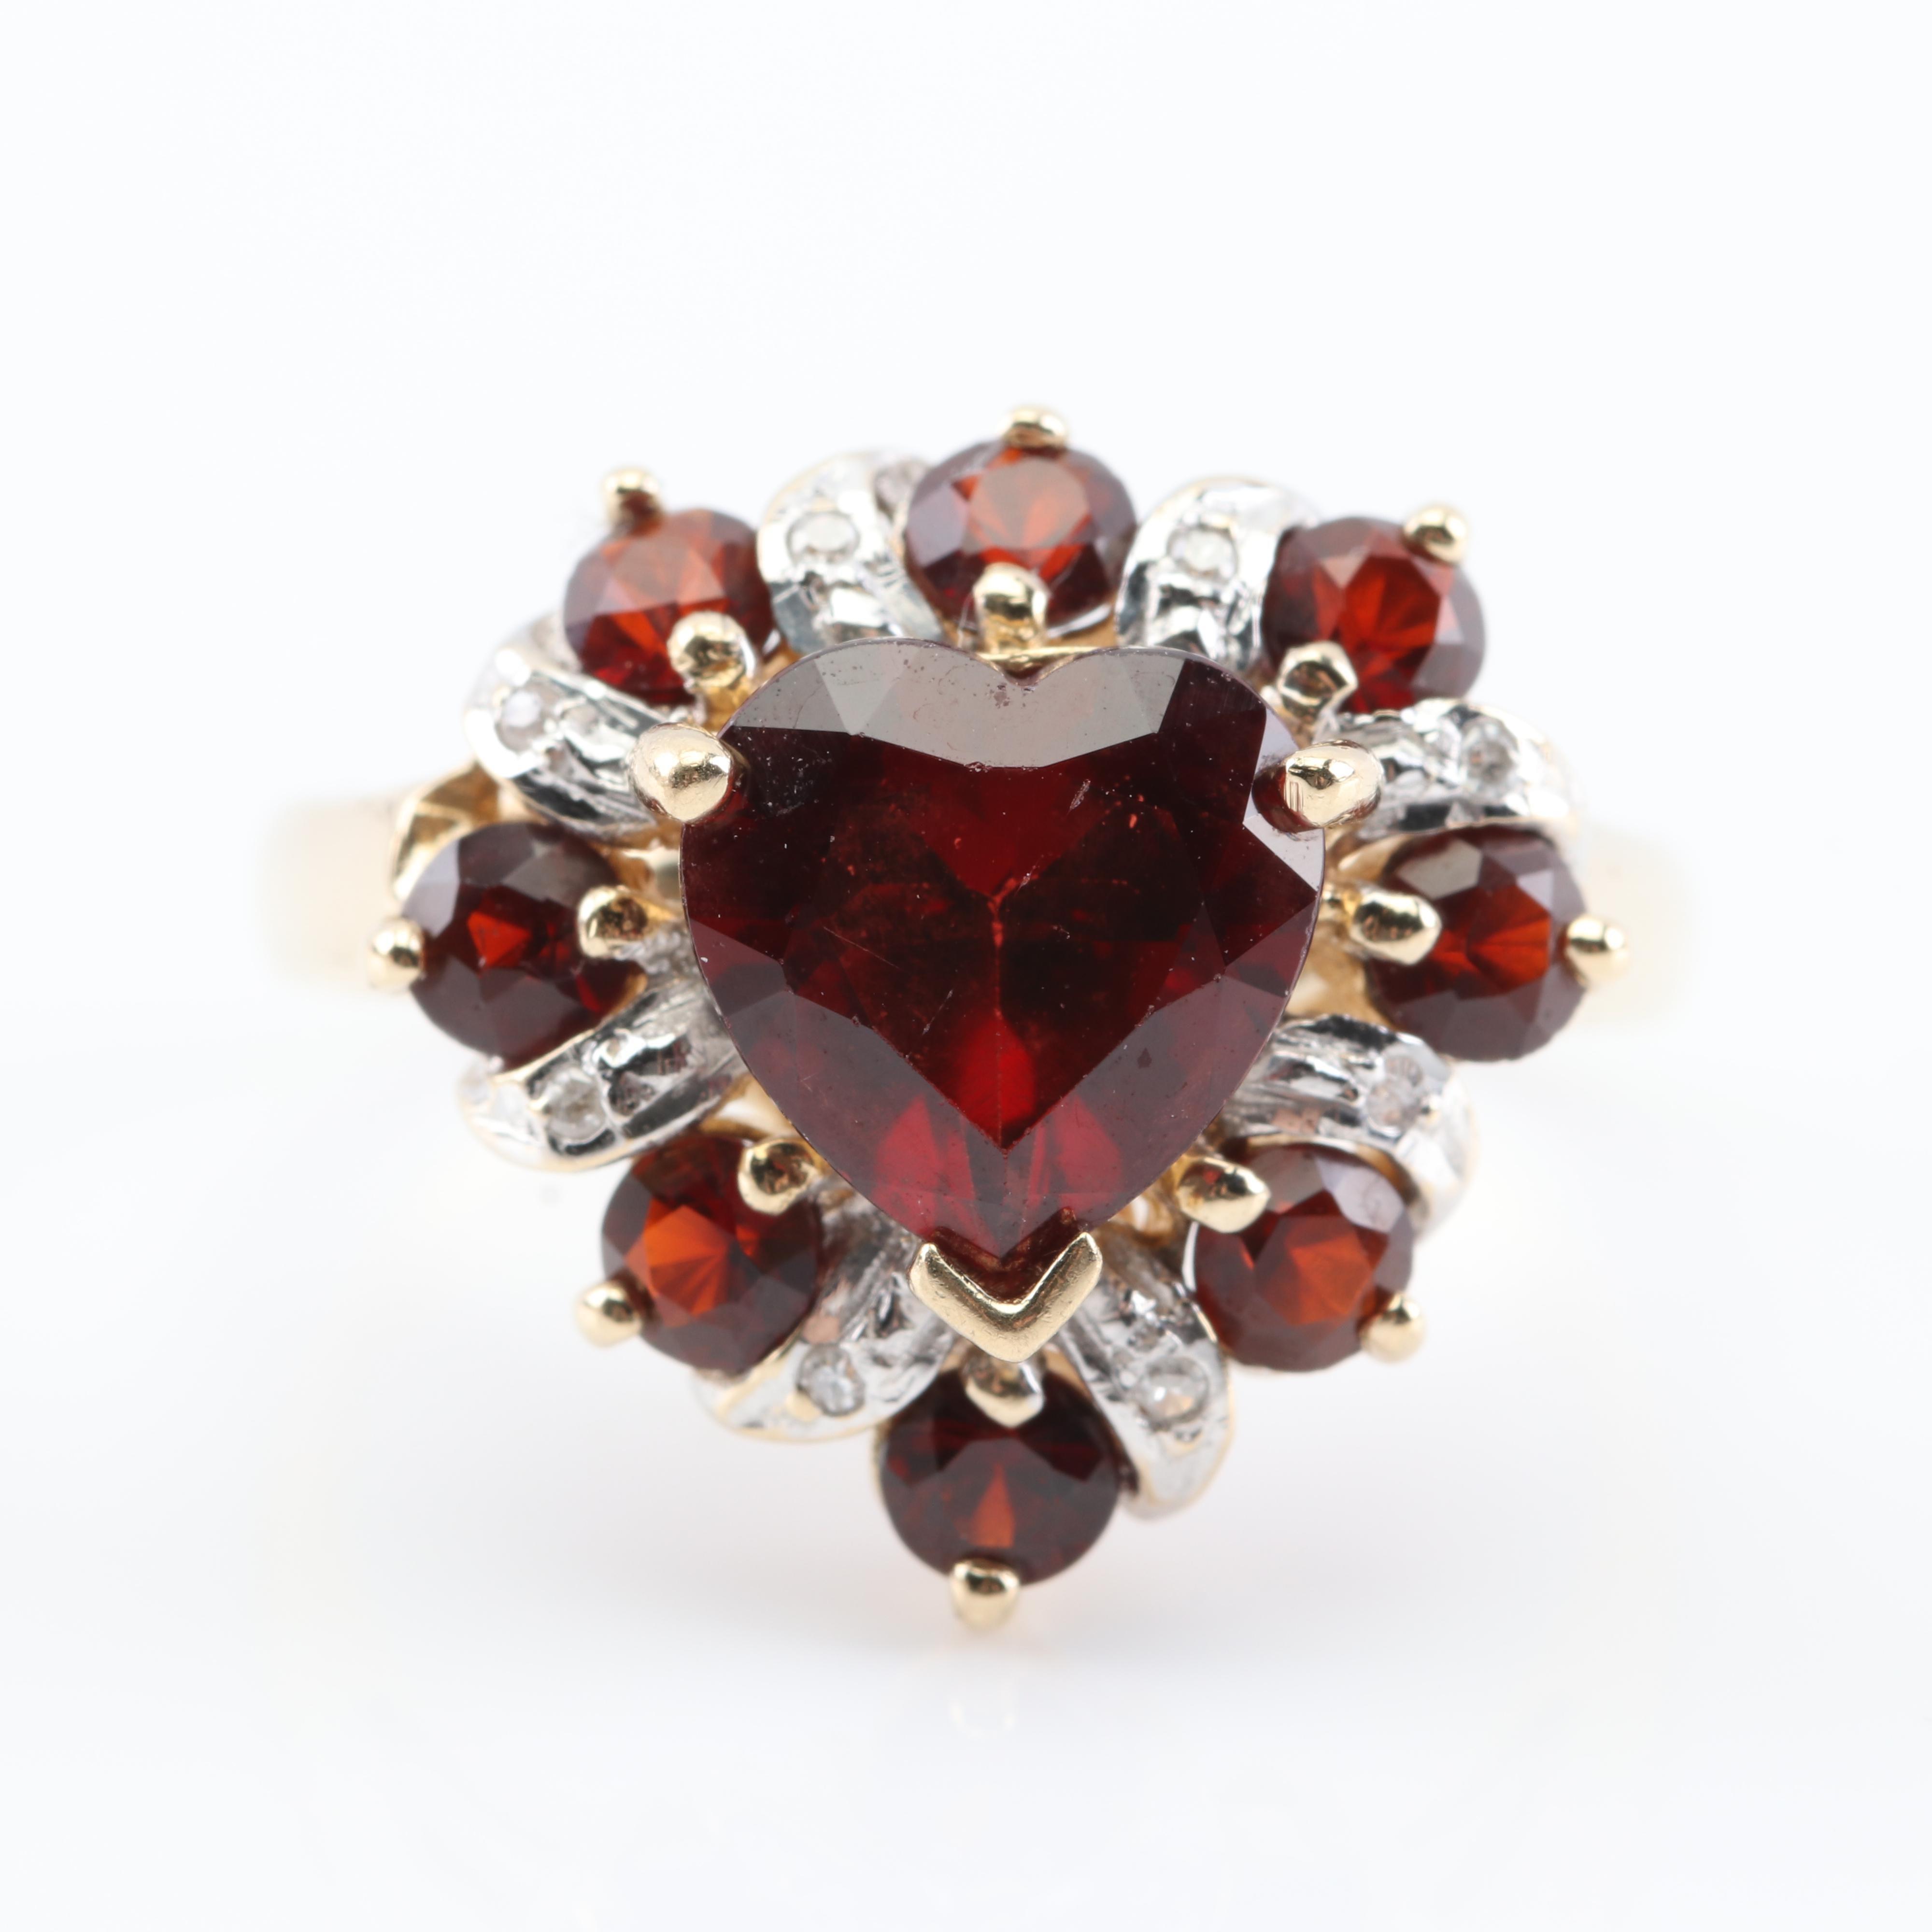 14K Yellow Gold Heart Shape Garnet and Diamond Ring